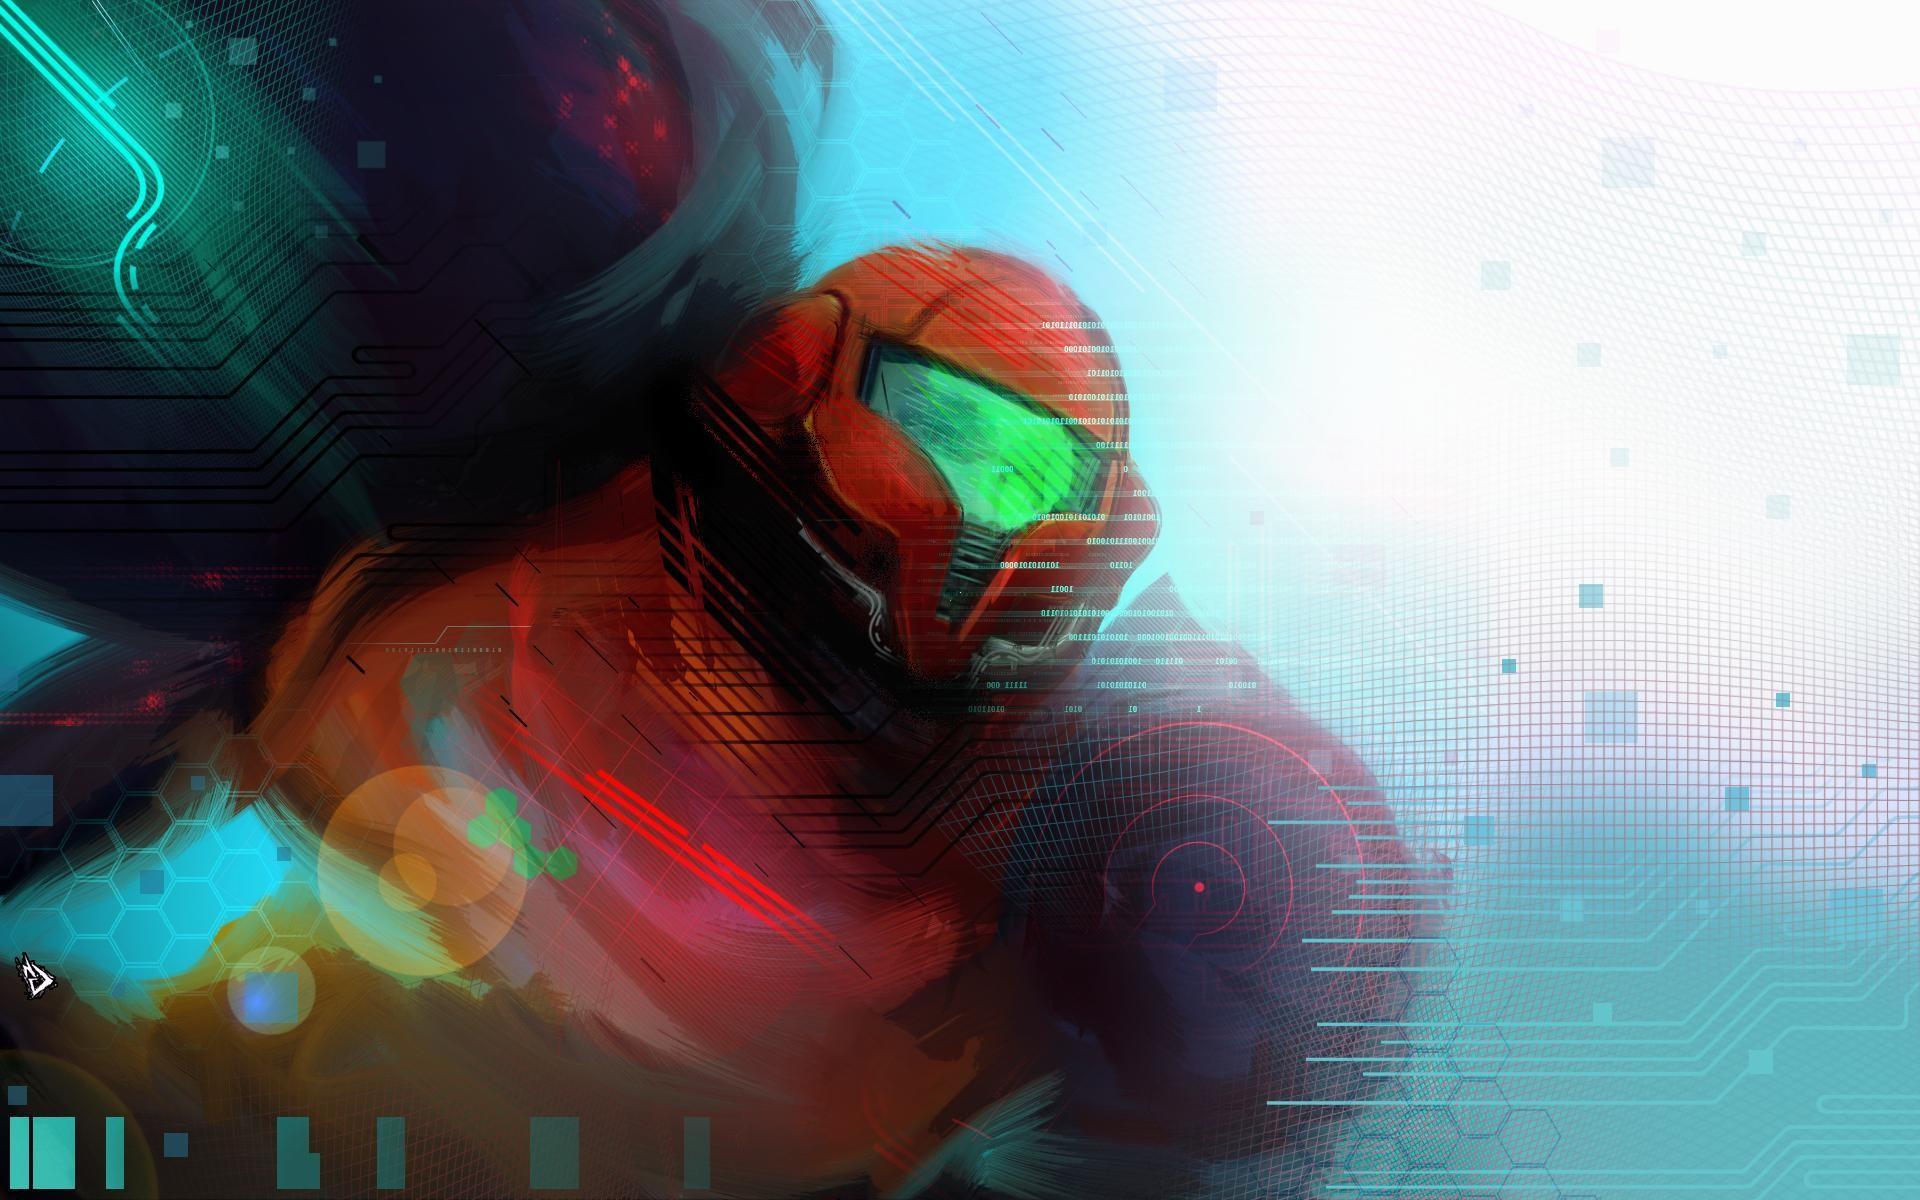 Metroid-HD-Wallpapers-Free-Download